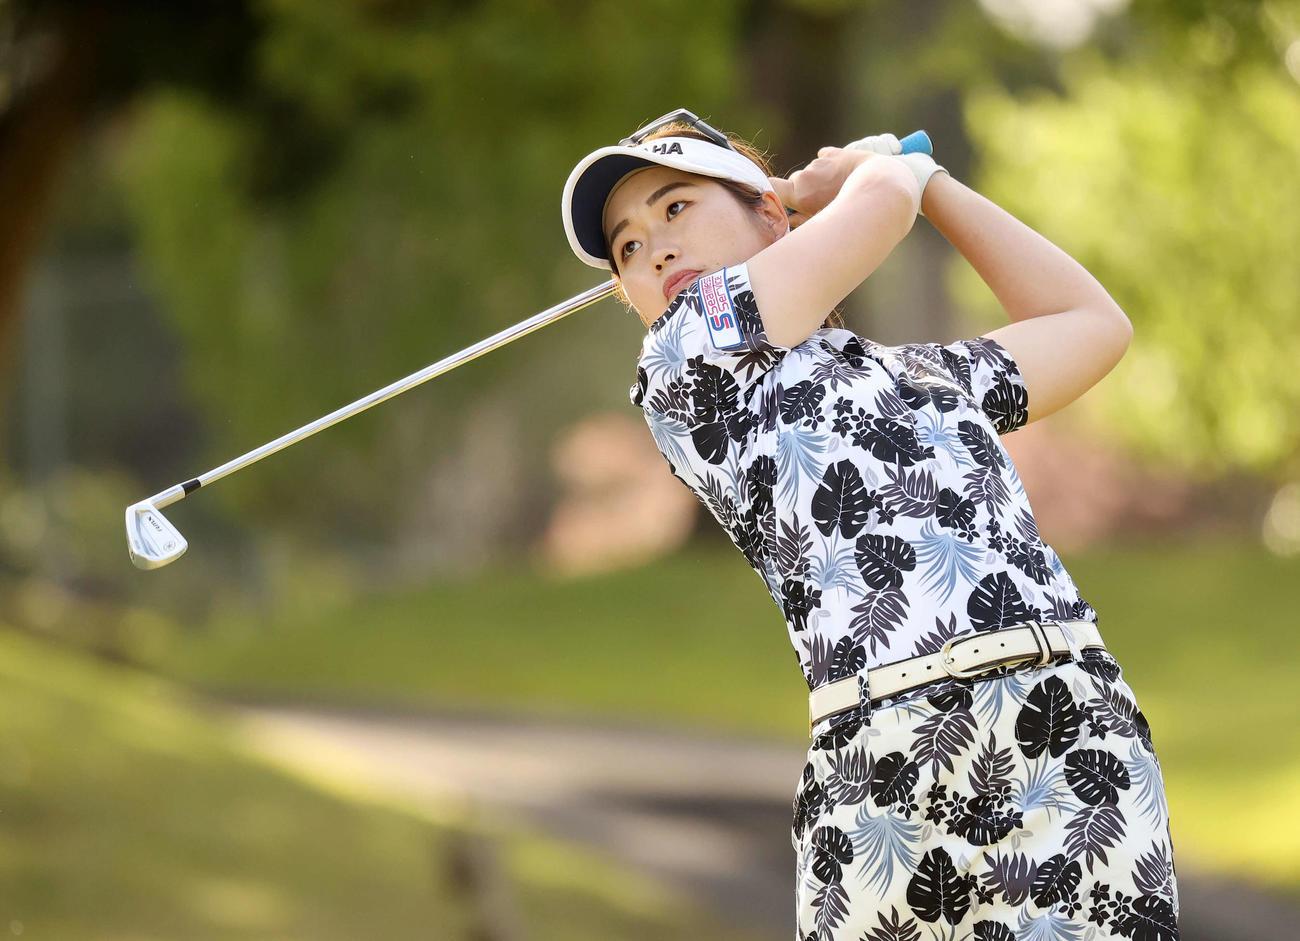 https://www.nikkansports.com/sports/golf/news/img/202104300000642-w1300_0.jpg